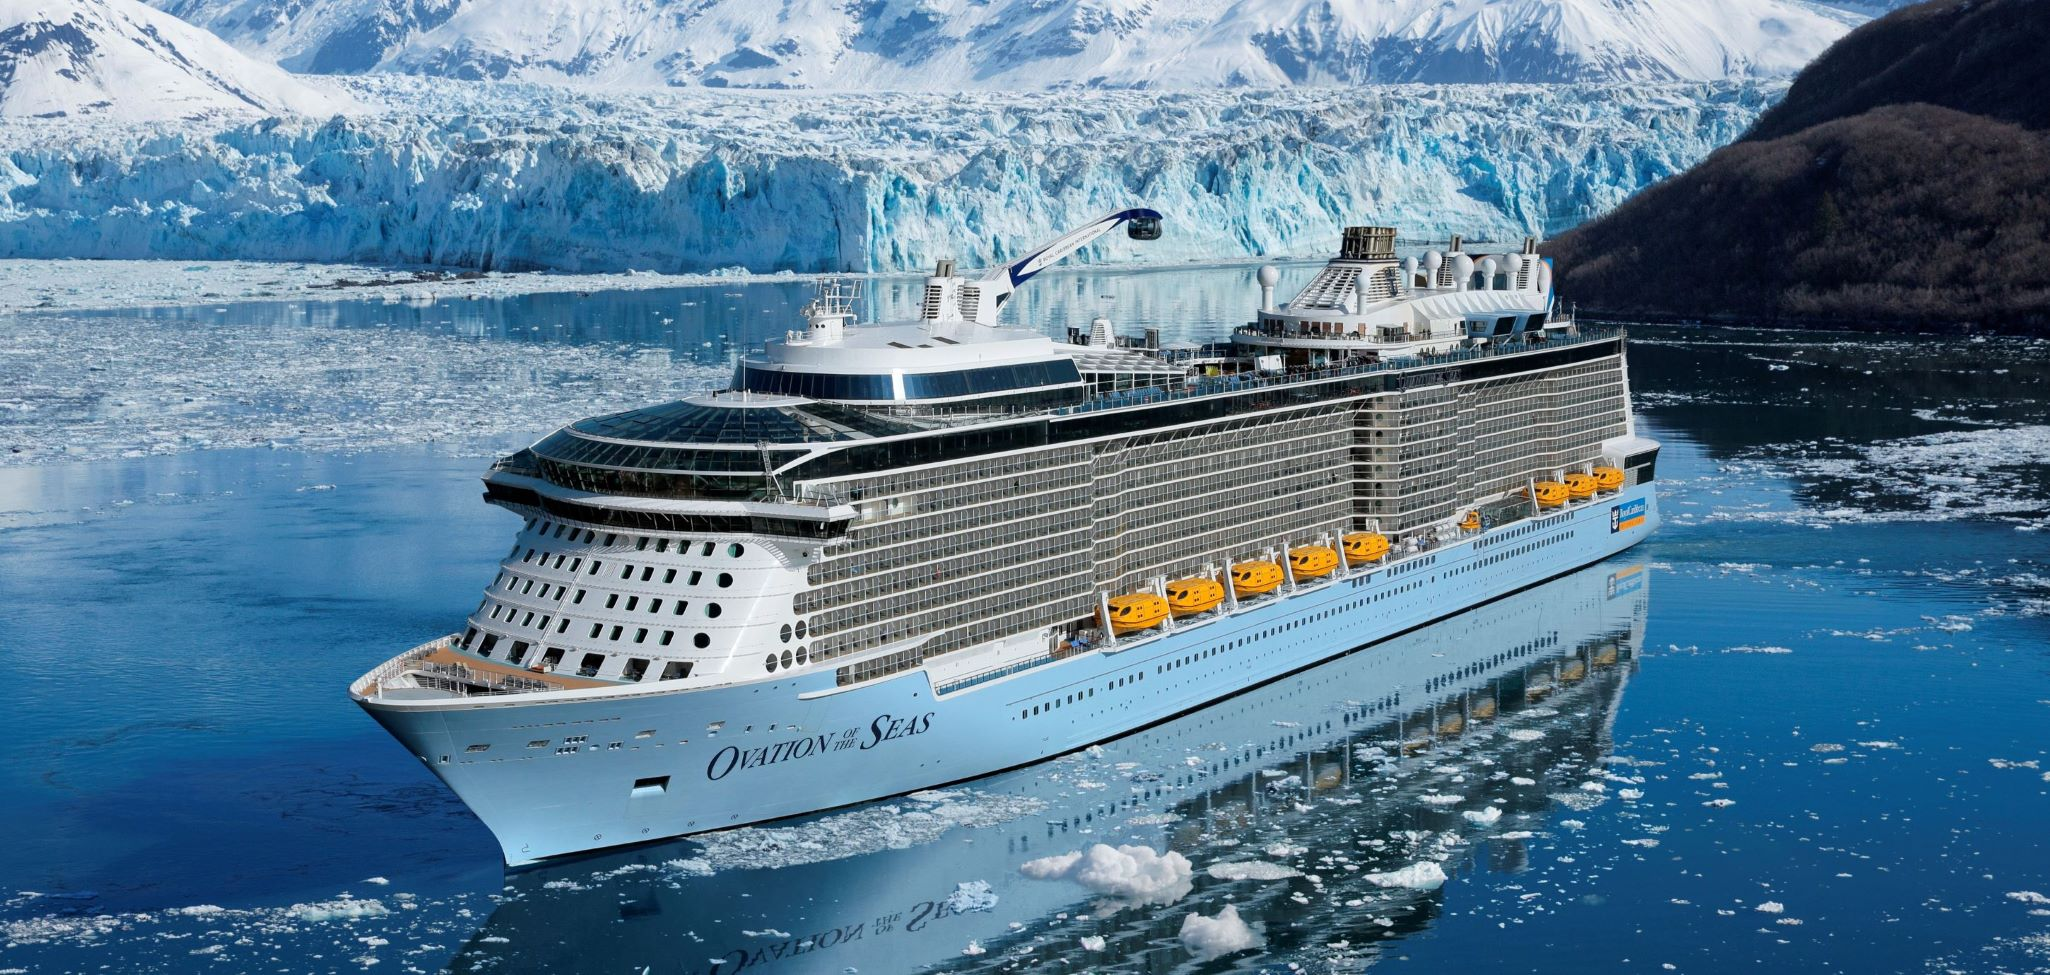 Royal Caribbean's <em>Ovation of the Seas</em>